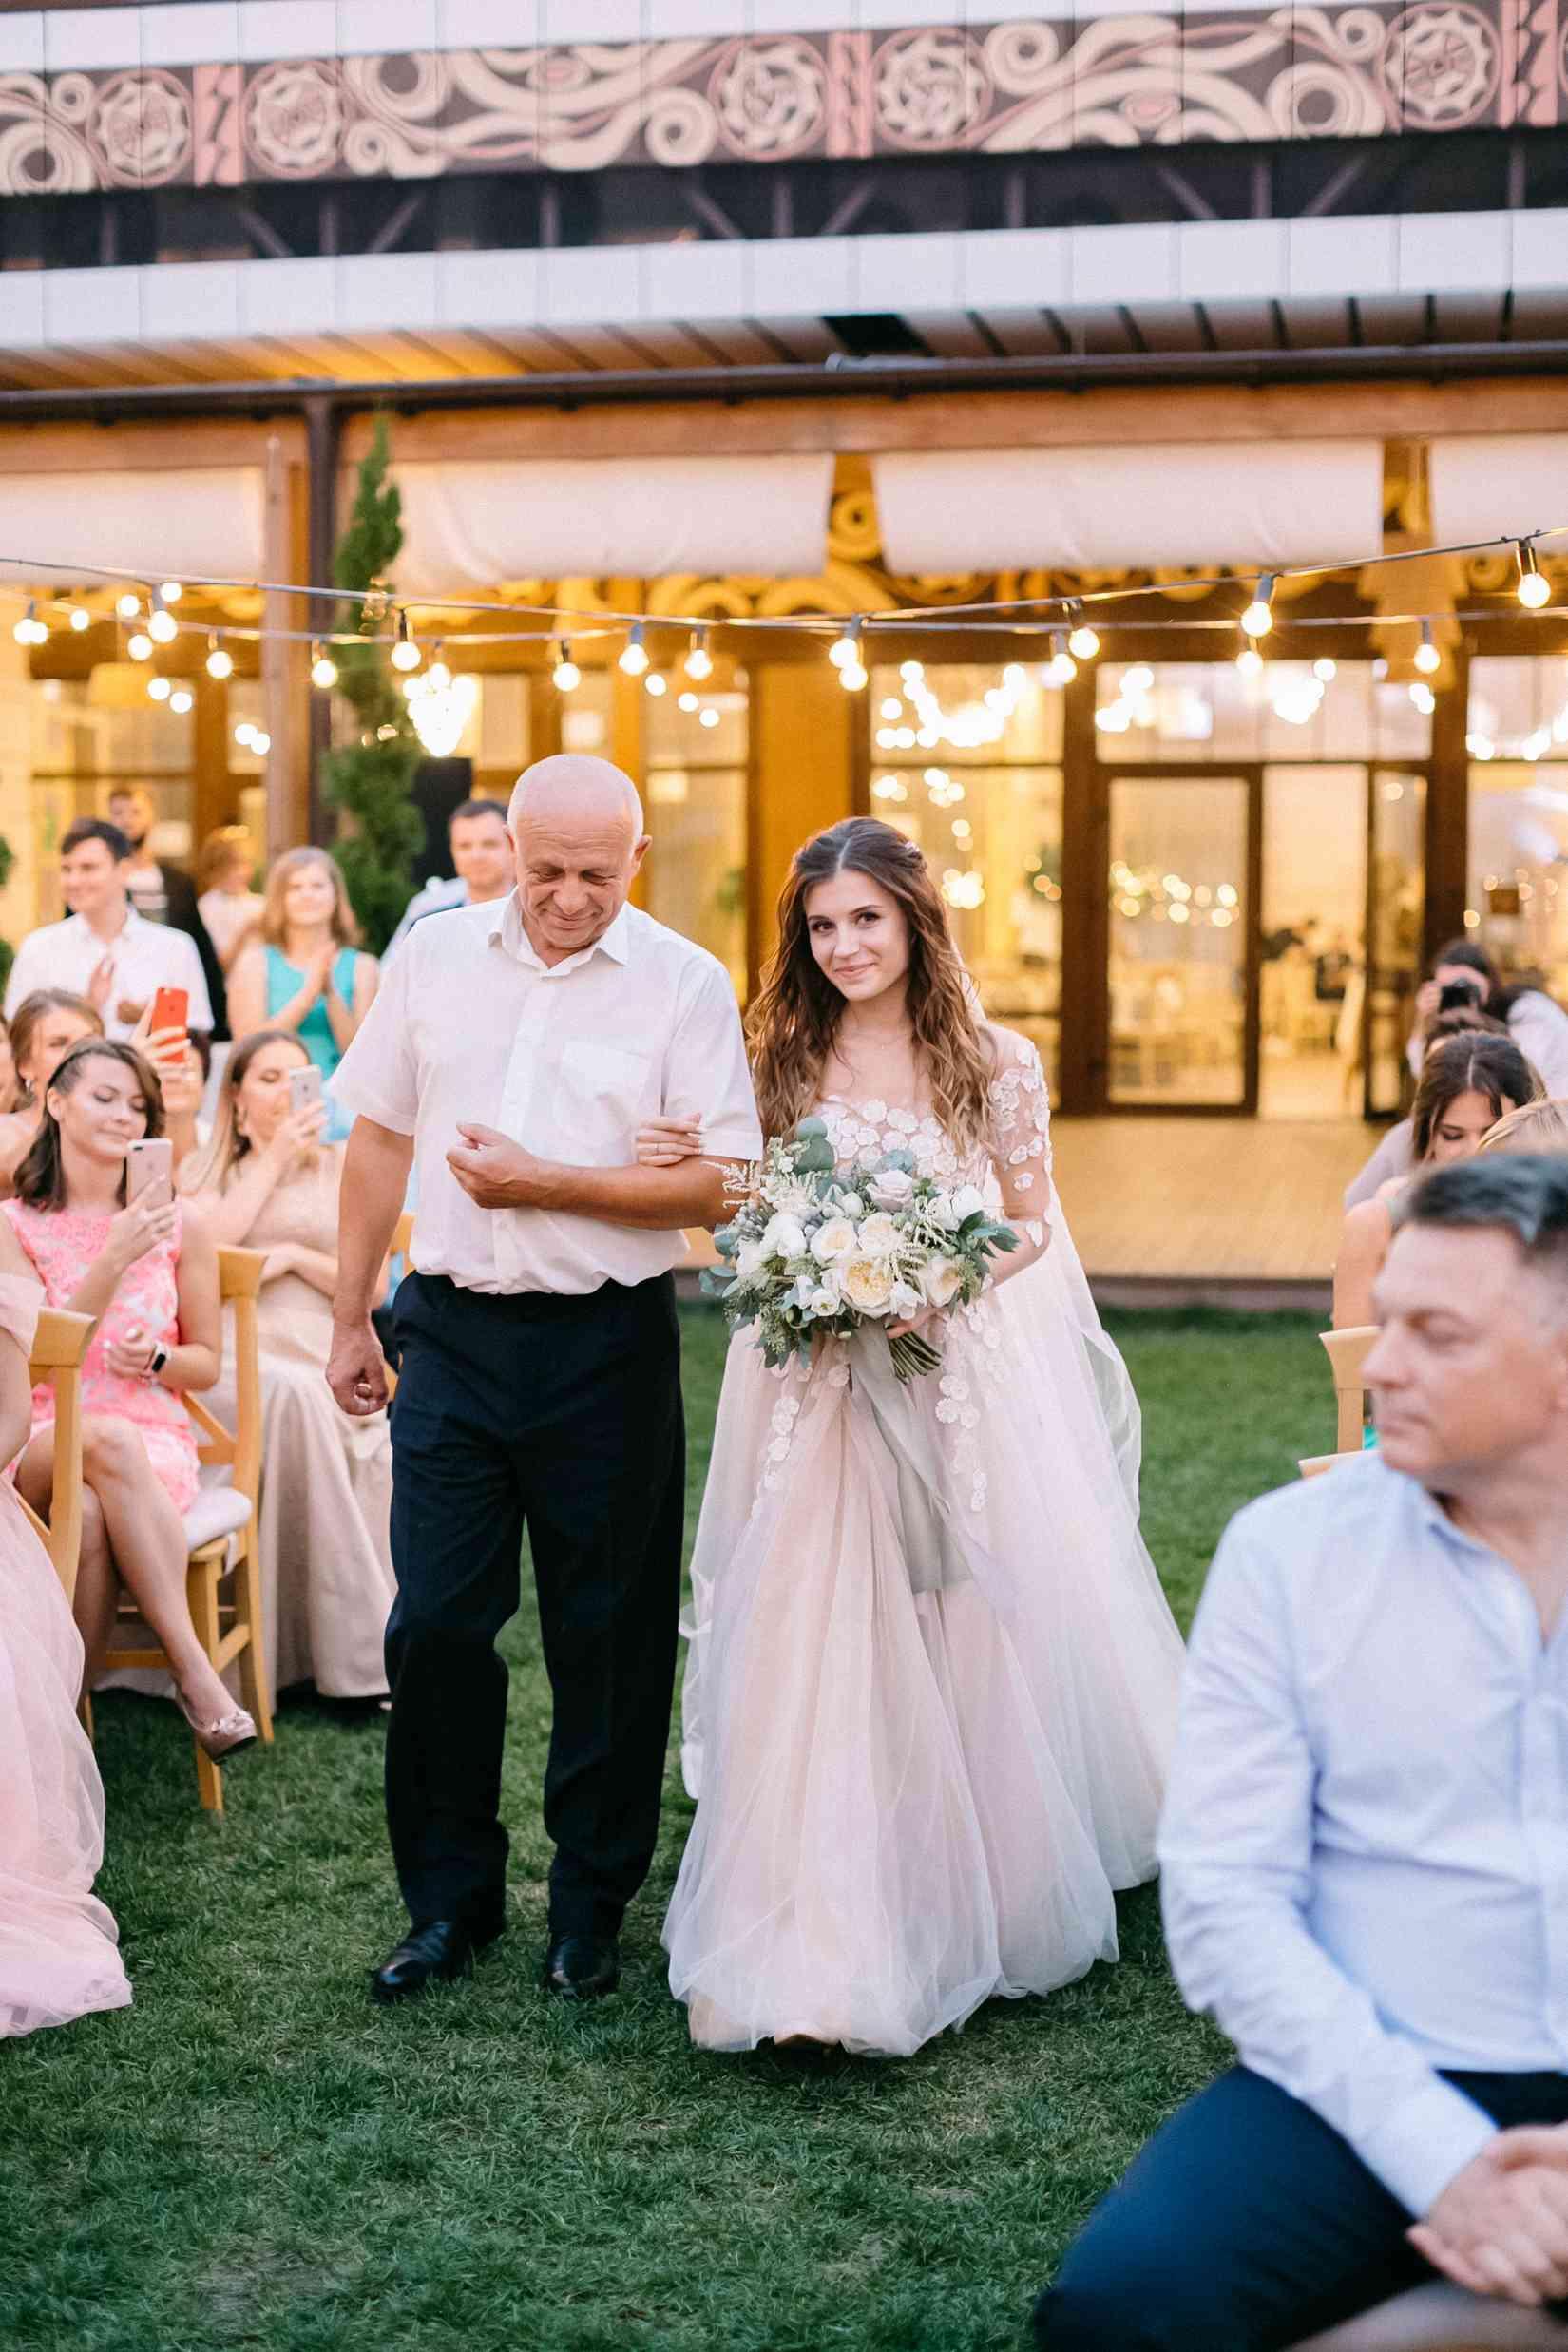 невеста с отцом выходят на церемонию